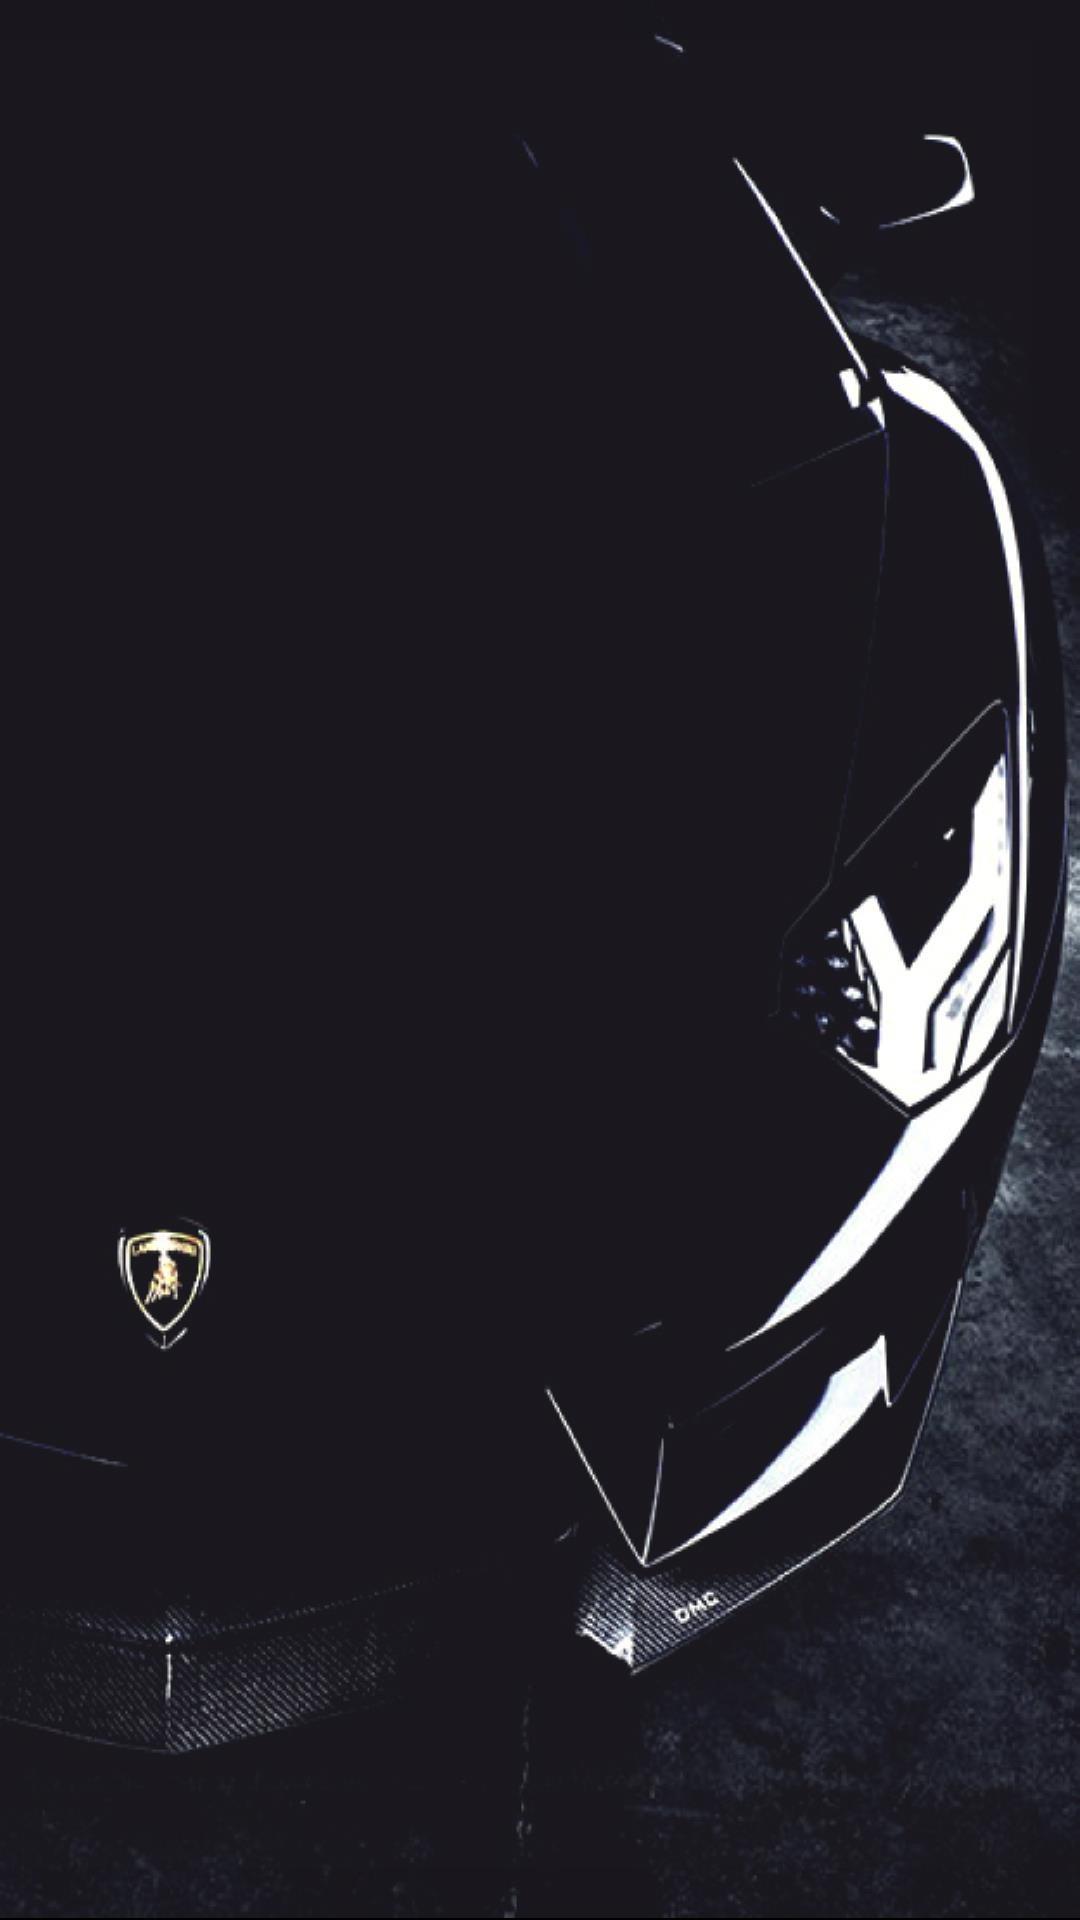 81 Black Lamborghini Wallpapers on WallpaperPlay 1080x1920